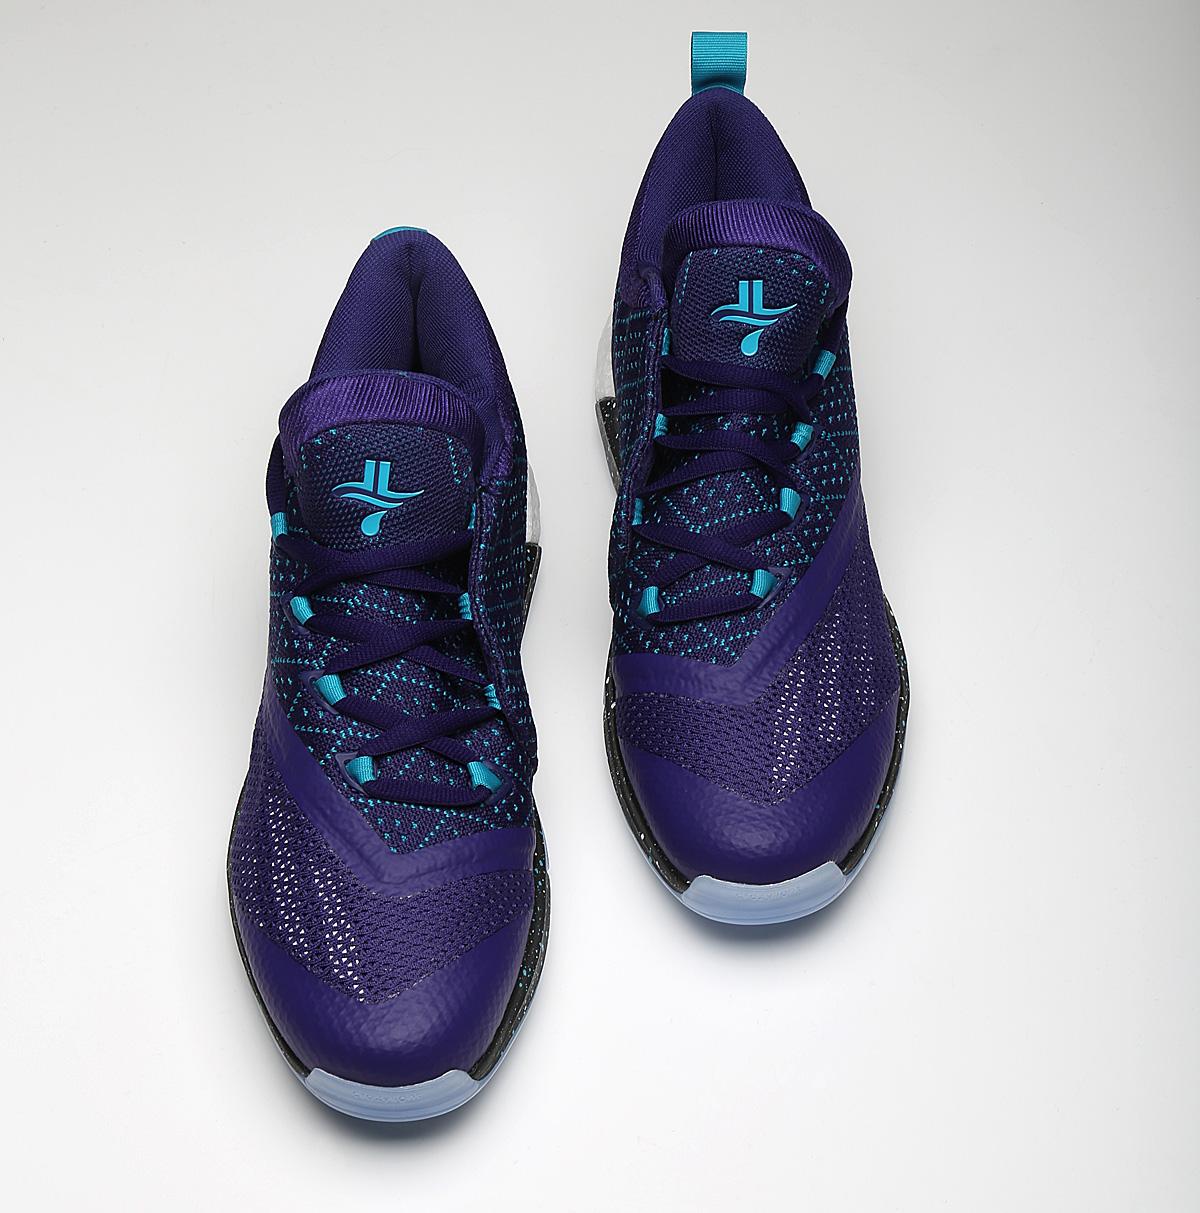 Jeremy-Lin-adidas-Crazylight-Boost_2-5-Away-3